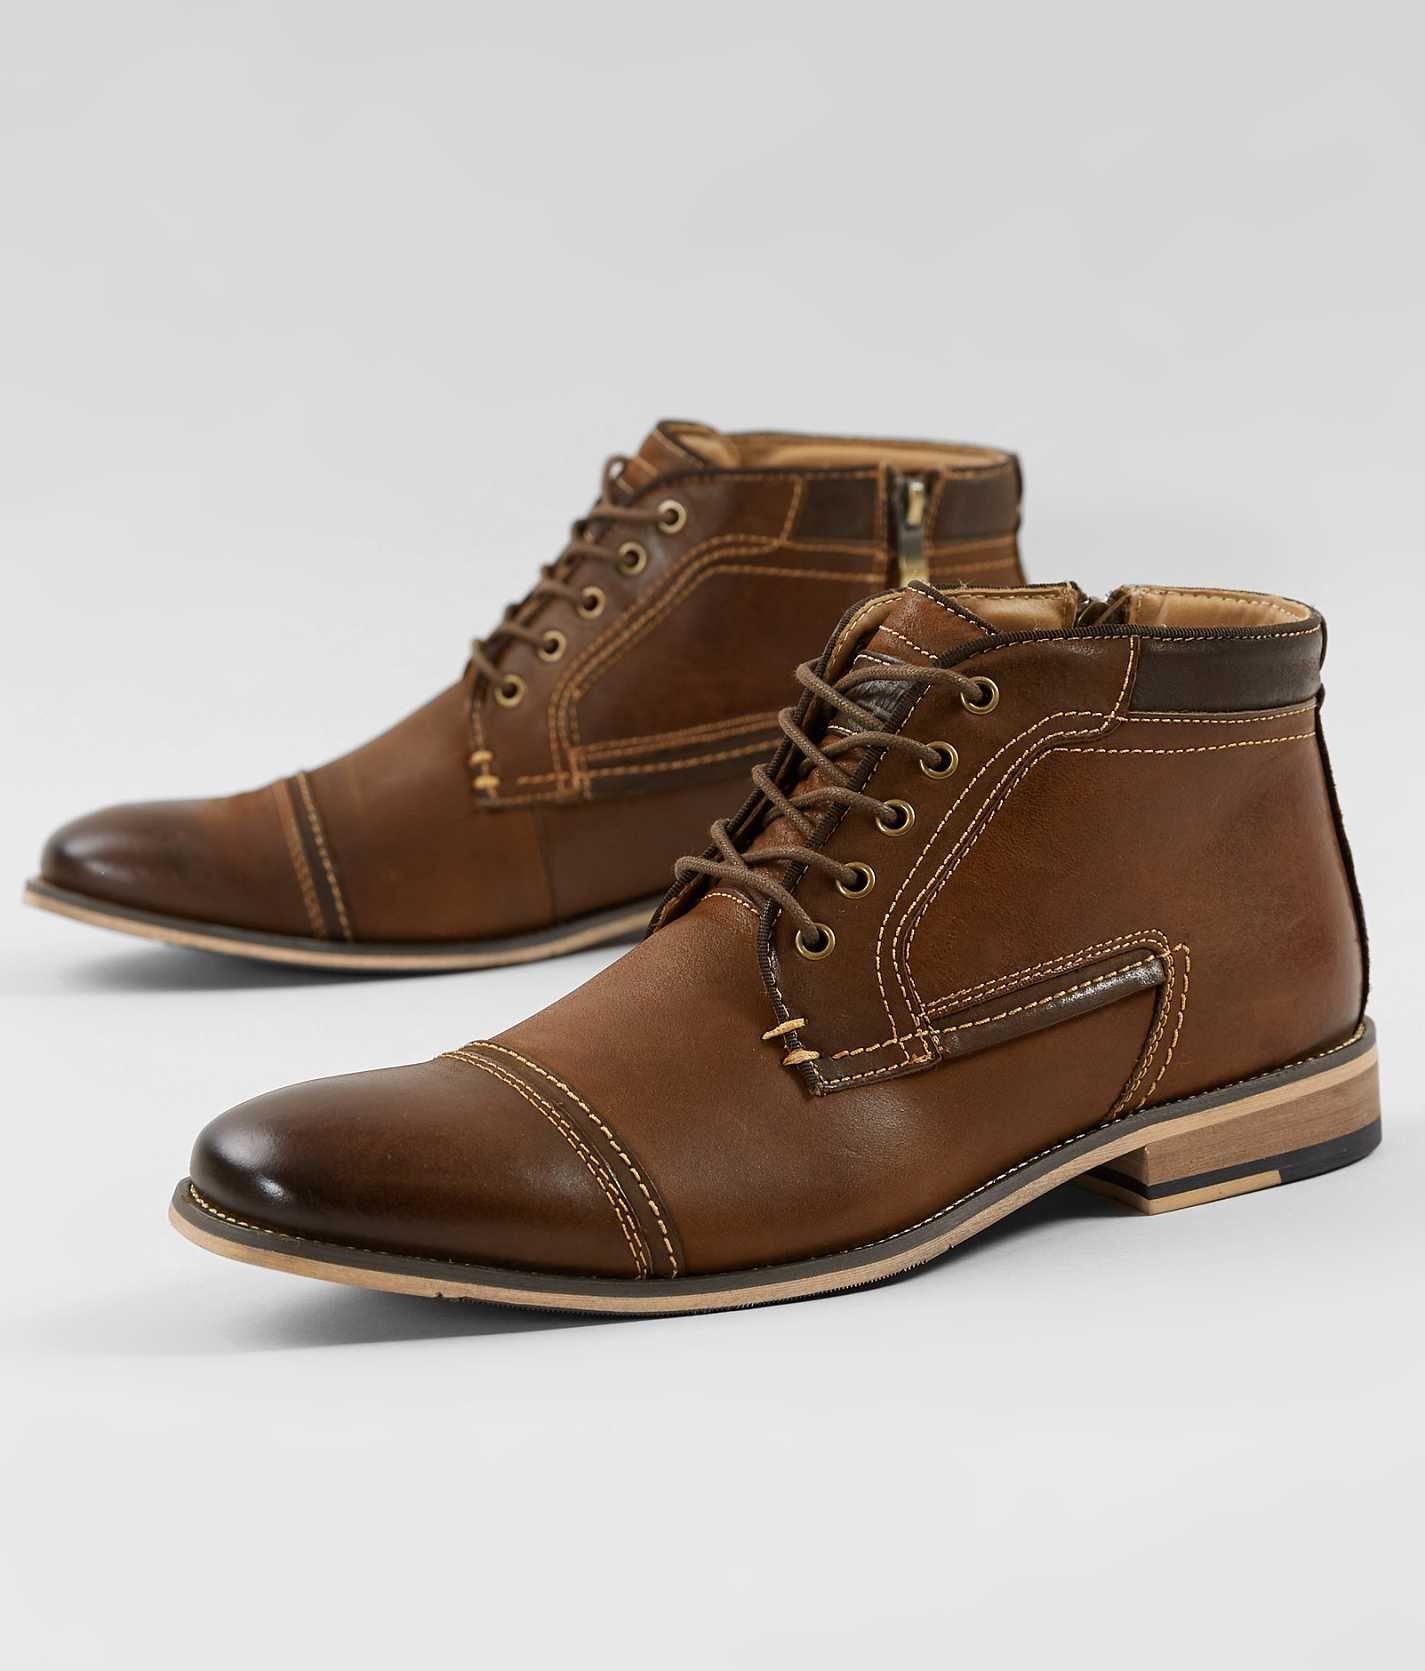 huella Campo Más allá  Steve Madden Joyce Shoe - Men's Shoes in Dark Tan | Buckle | Leather shoes  men, Mens fashion rugged, Shoes mens